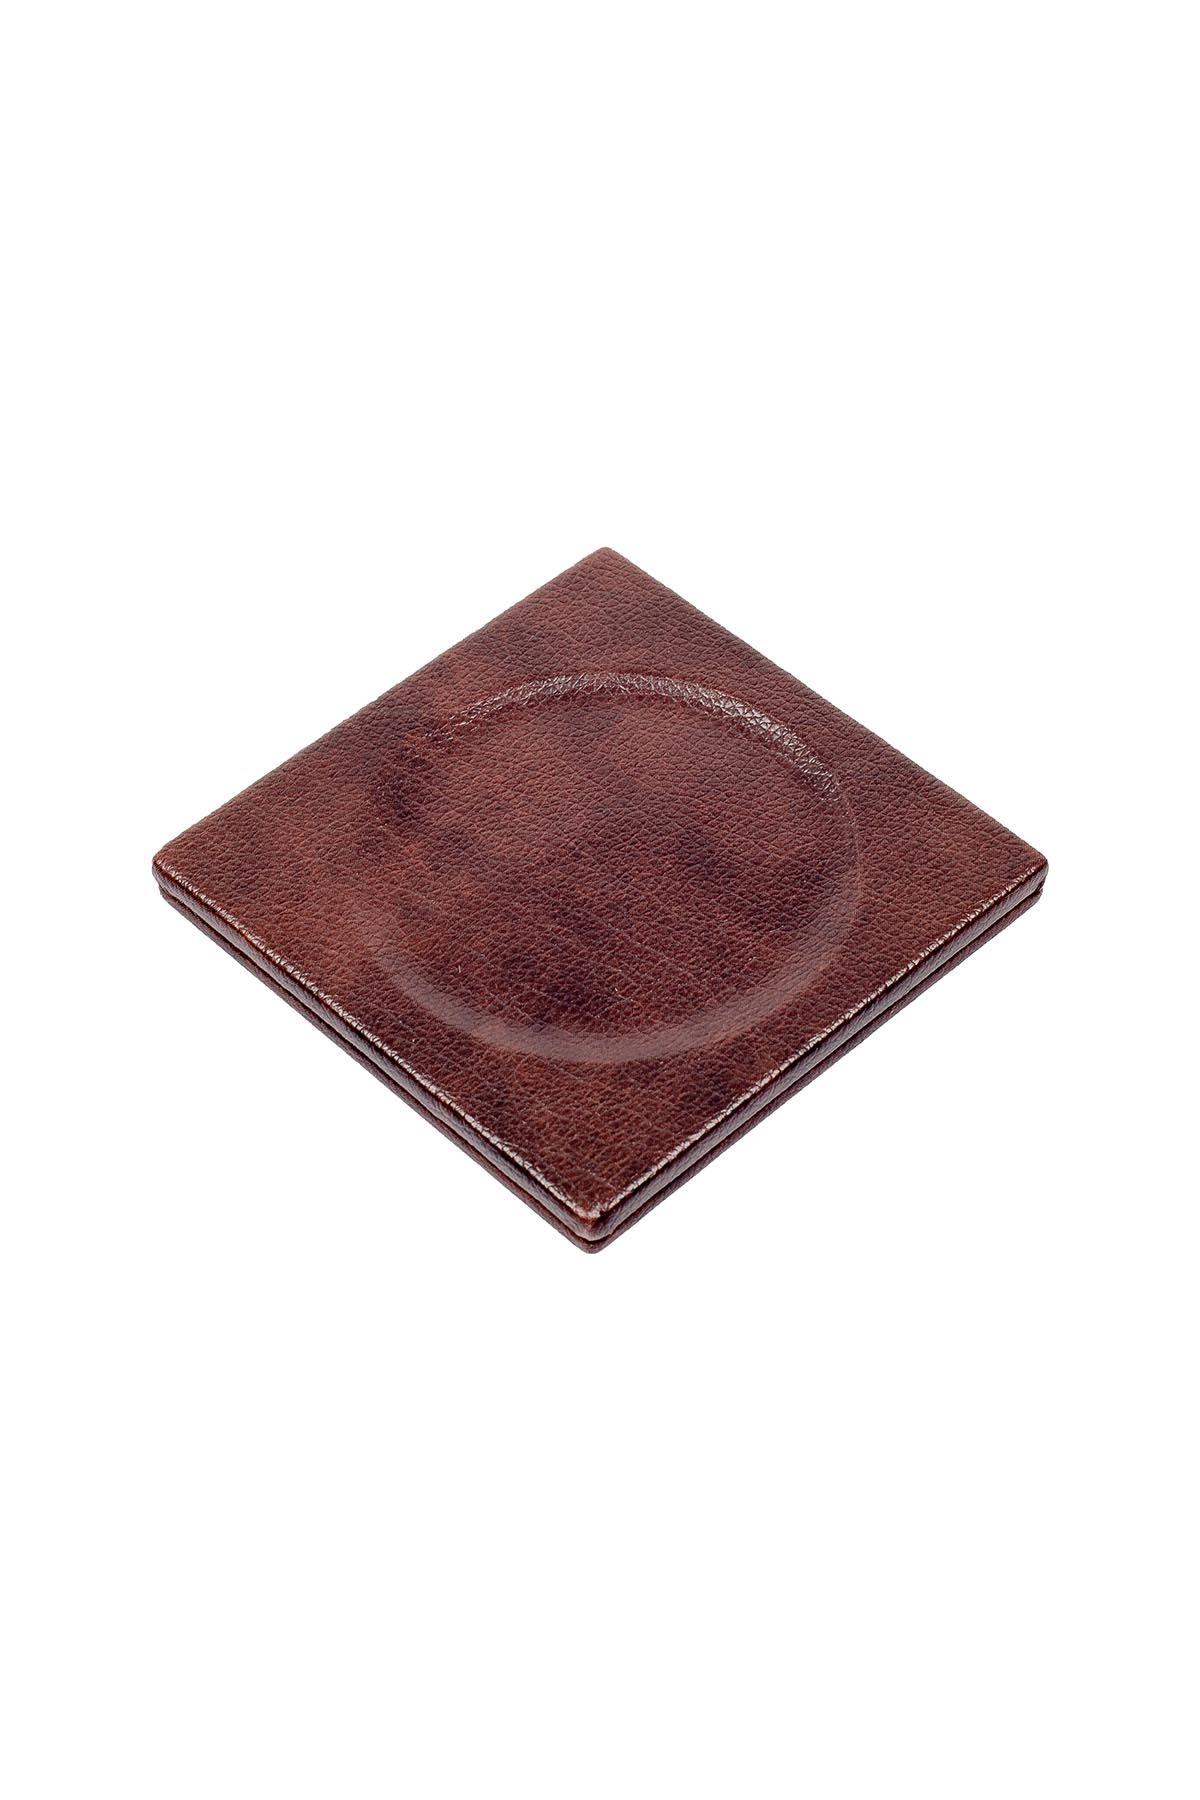 Leather Desk Set 4 Accessories Brown